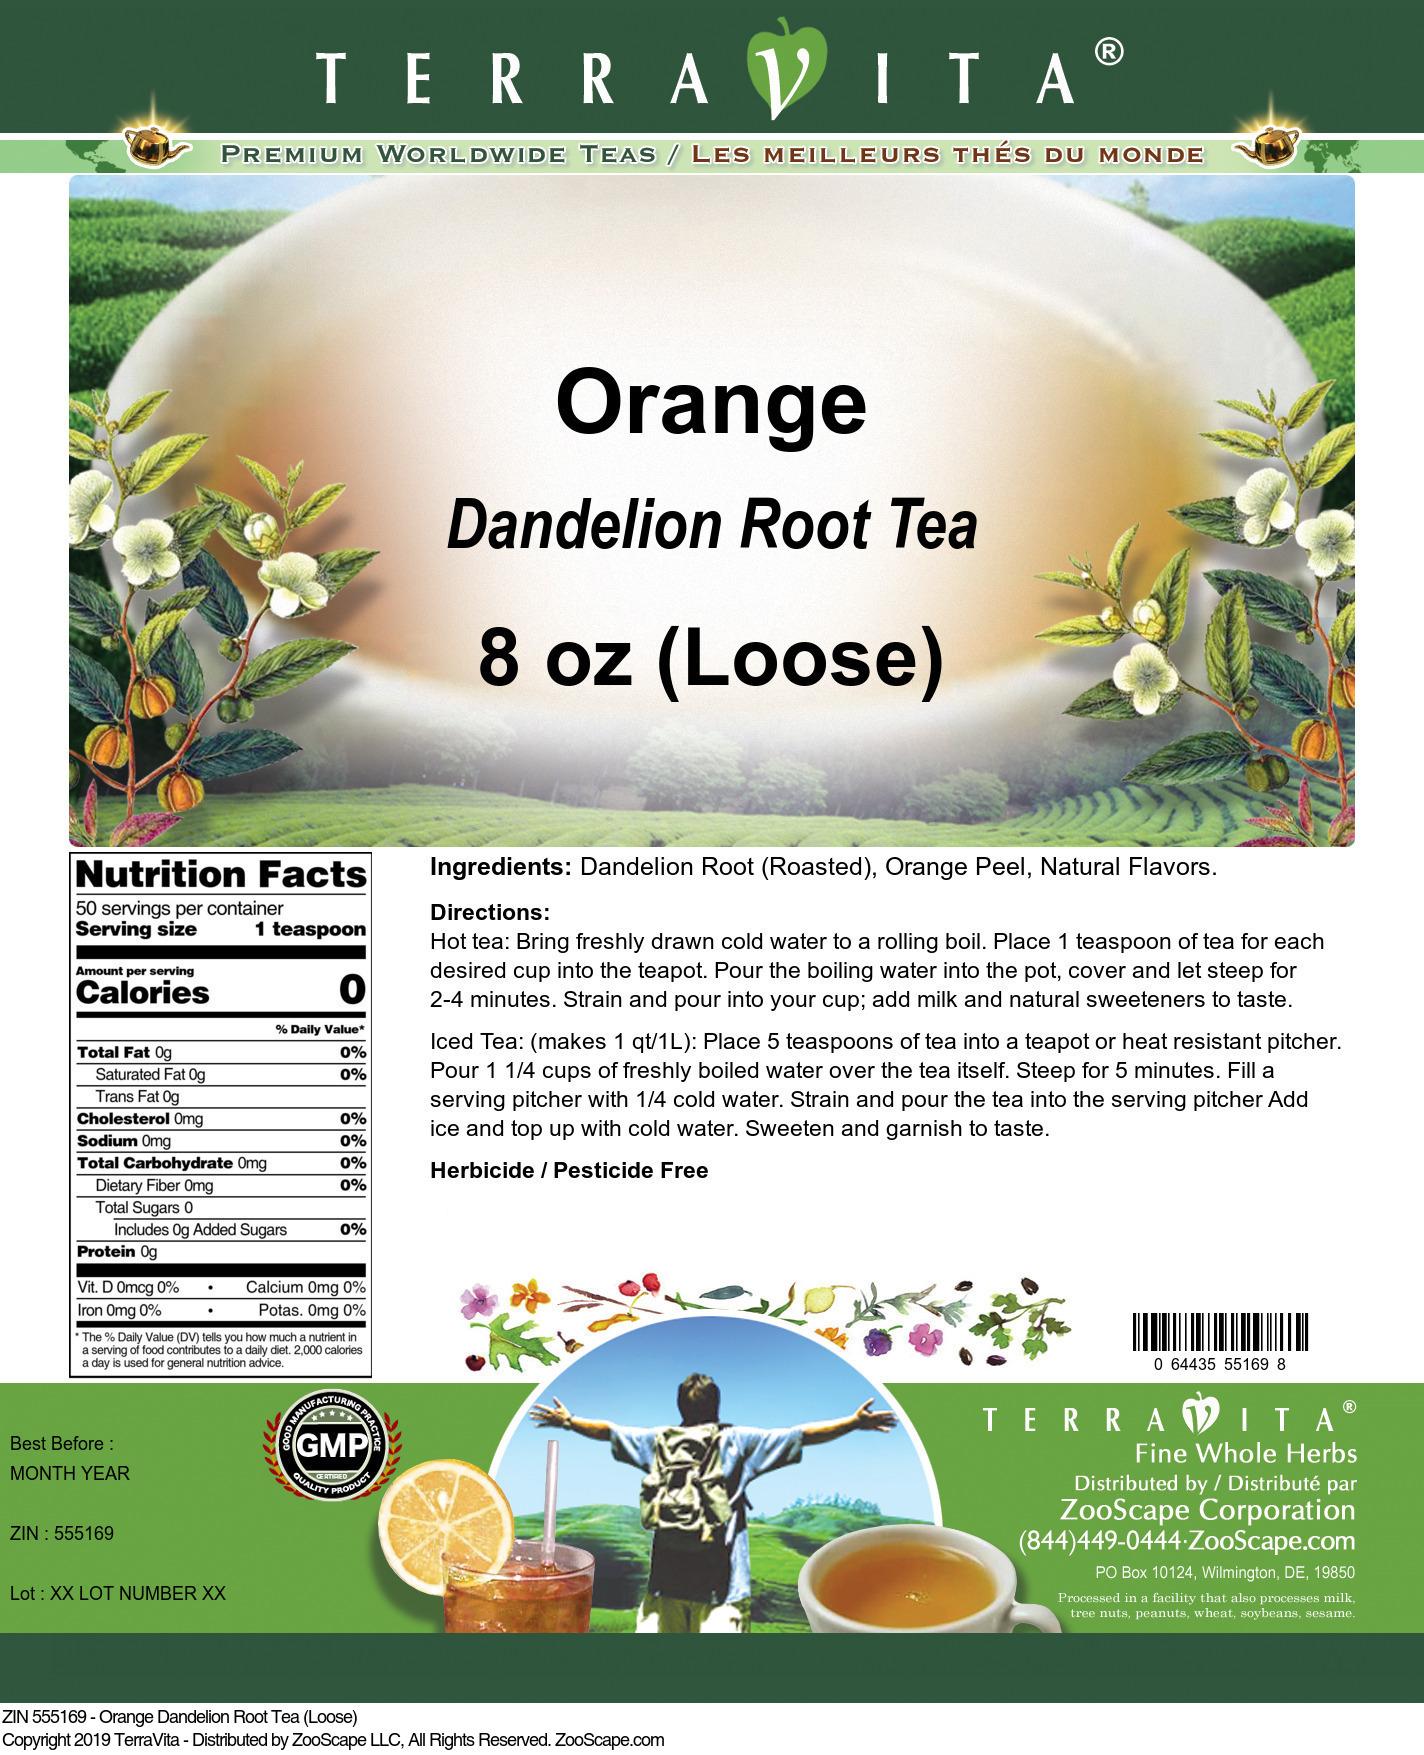 Orange Dandelion Root